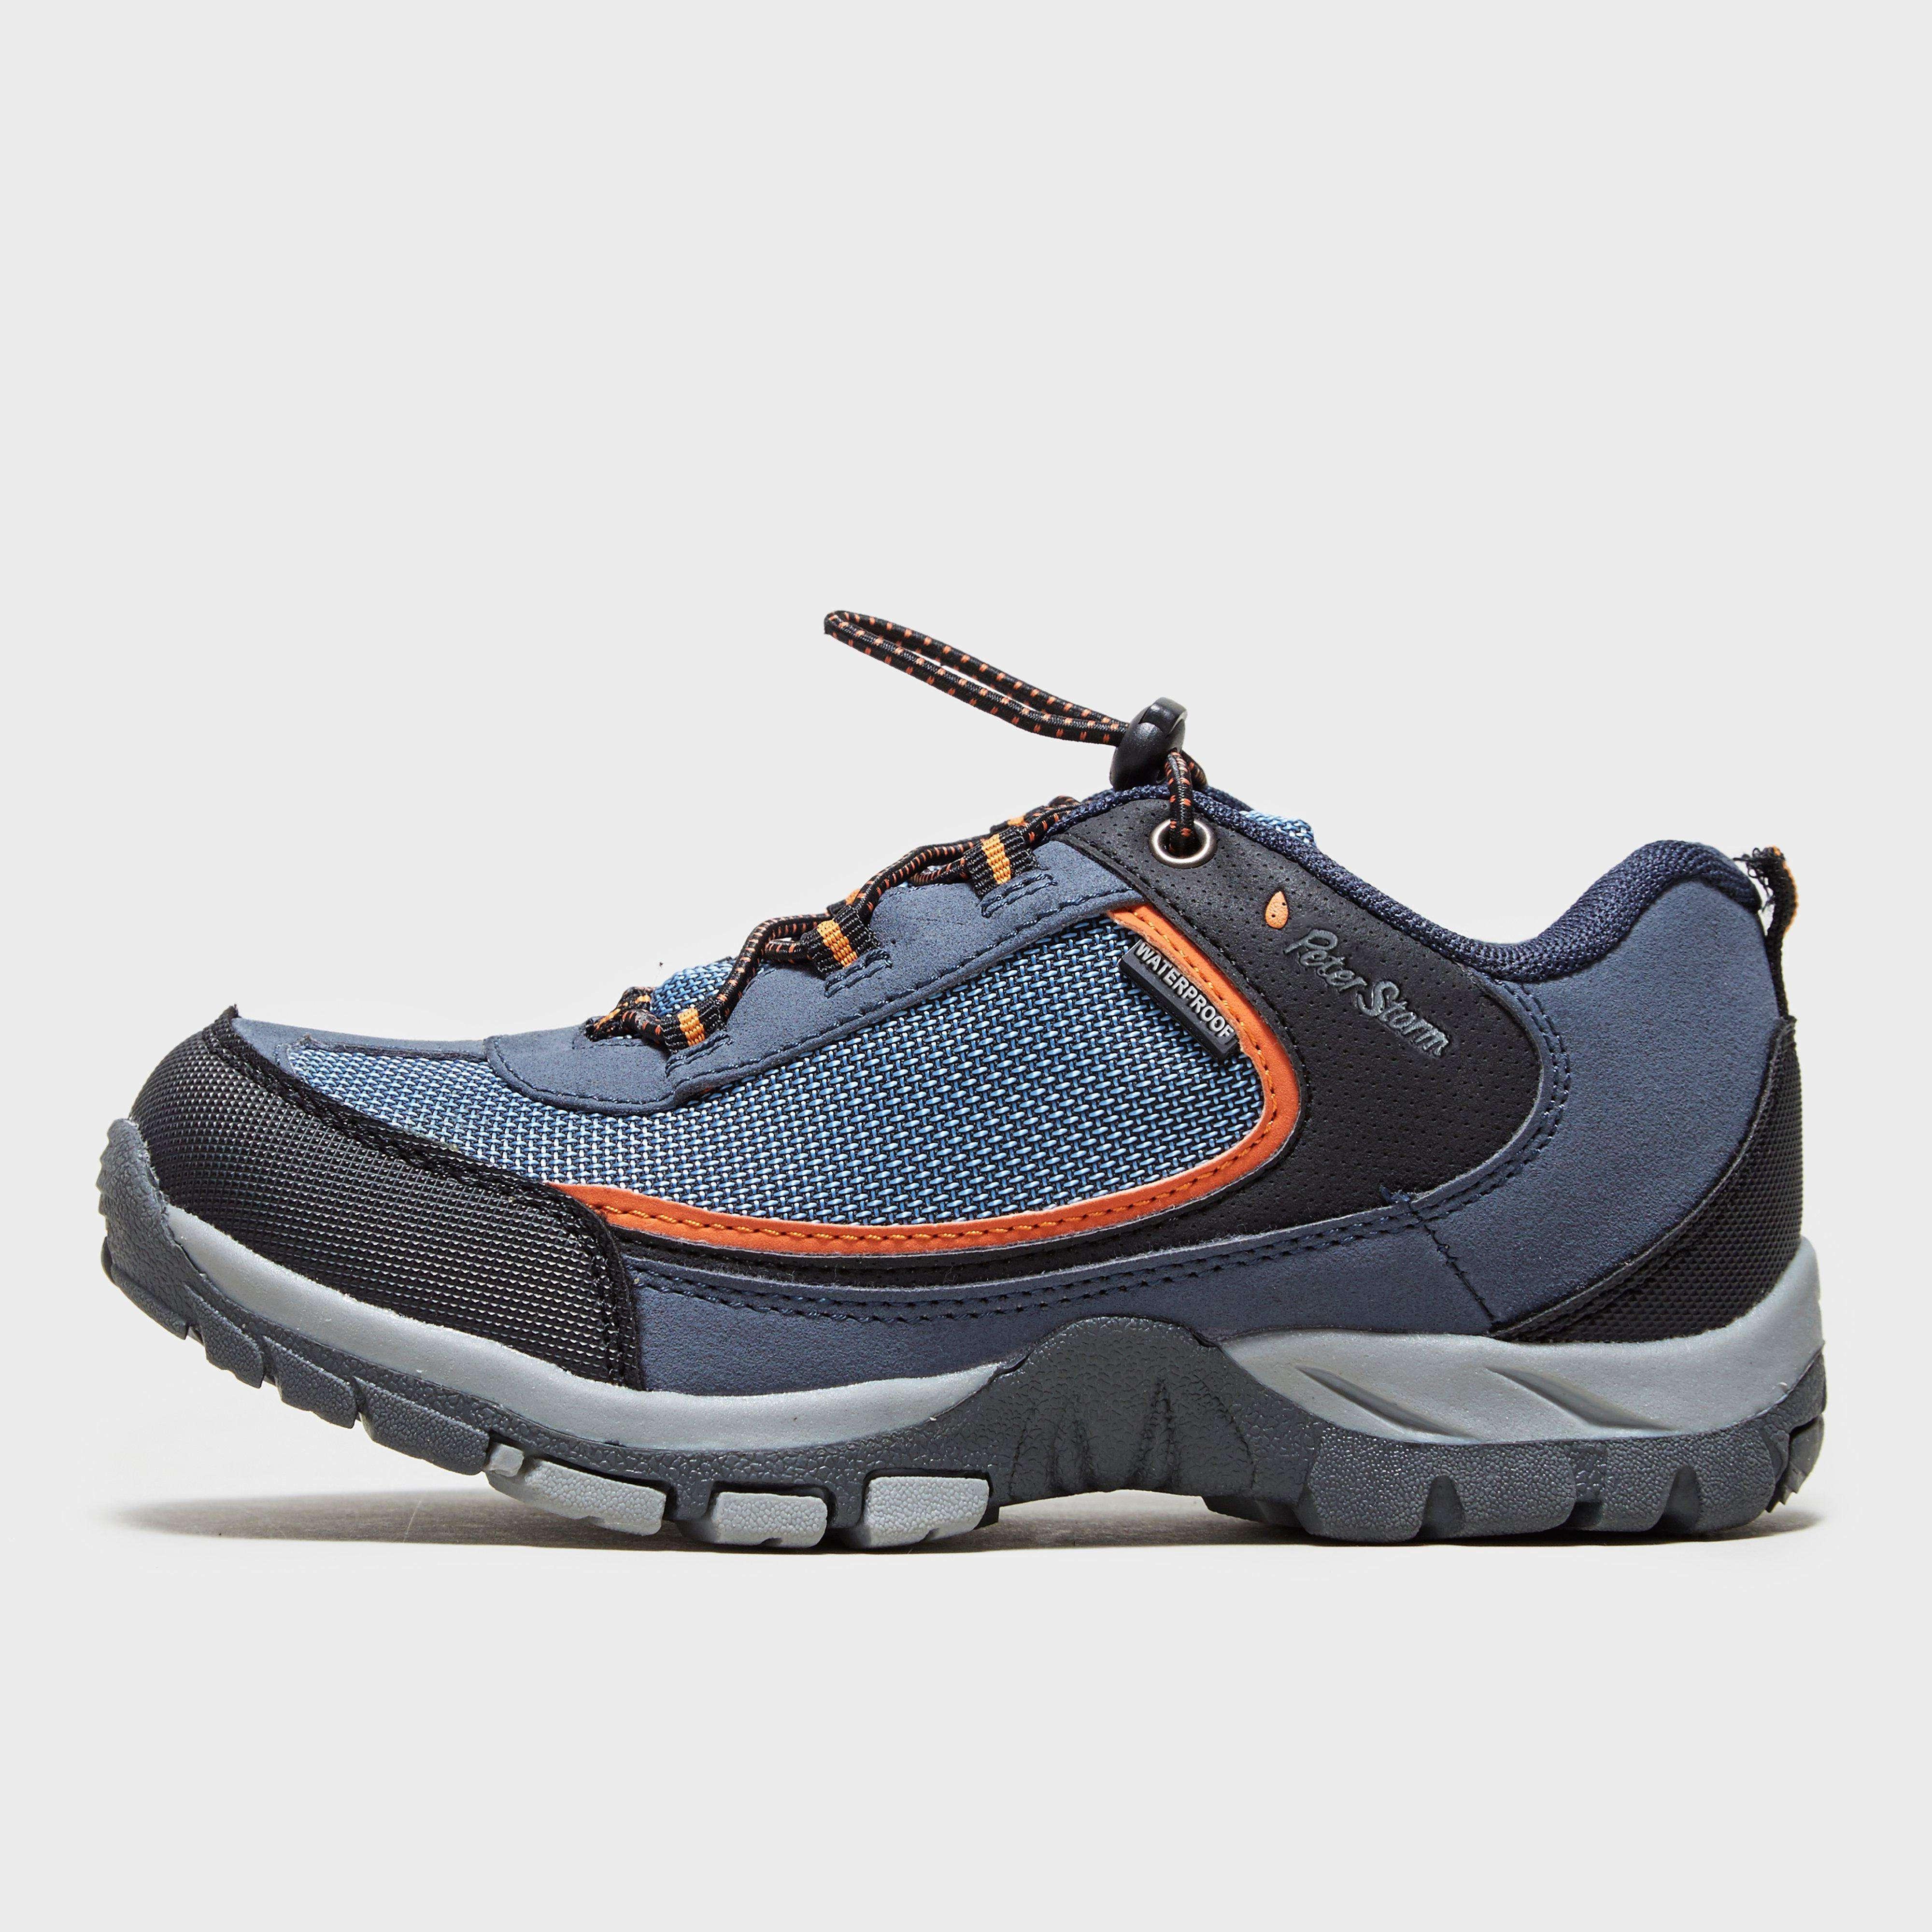 PETER STORM Boys' Hampton Waterproof Walking Shoe